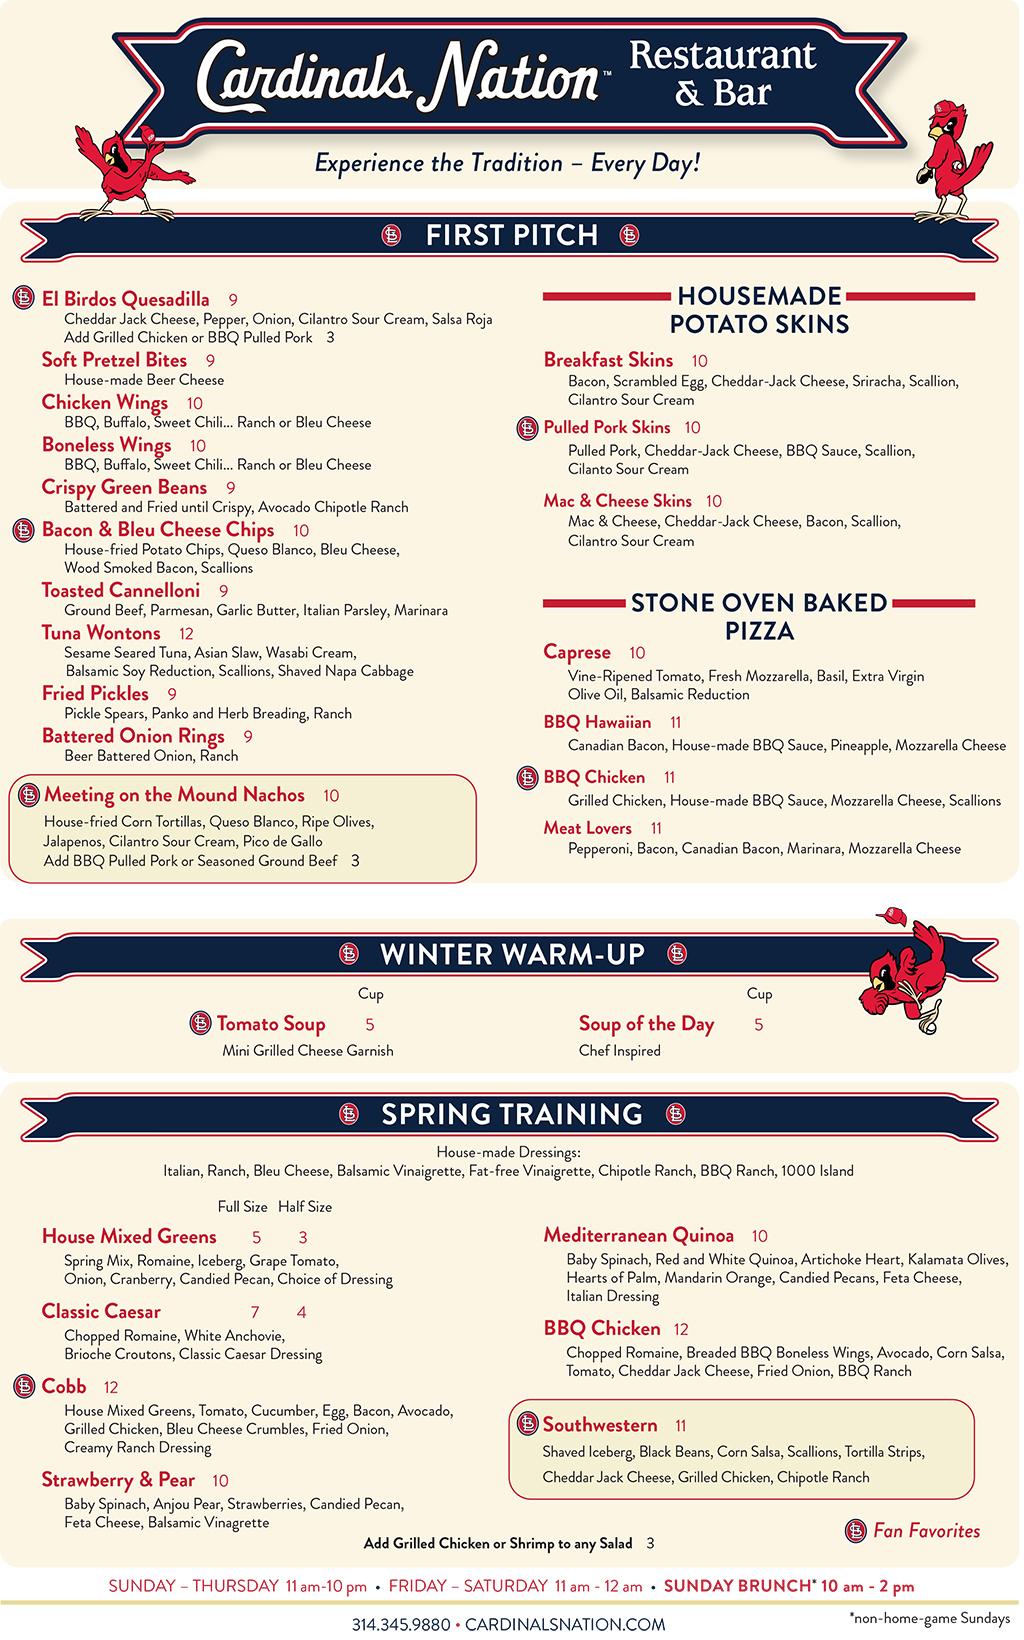 cardinals nation restaurant bar menu